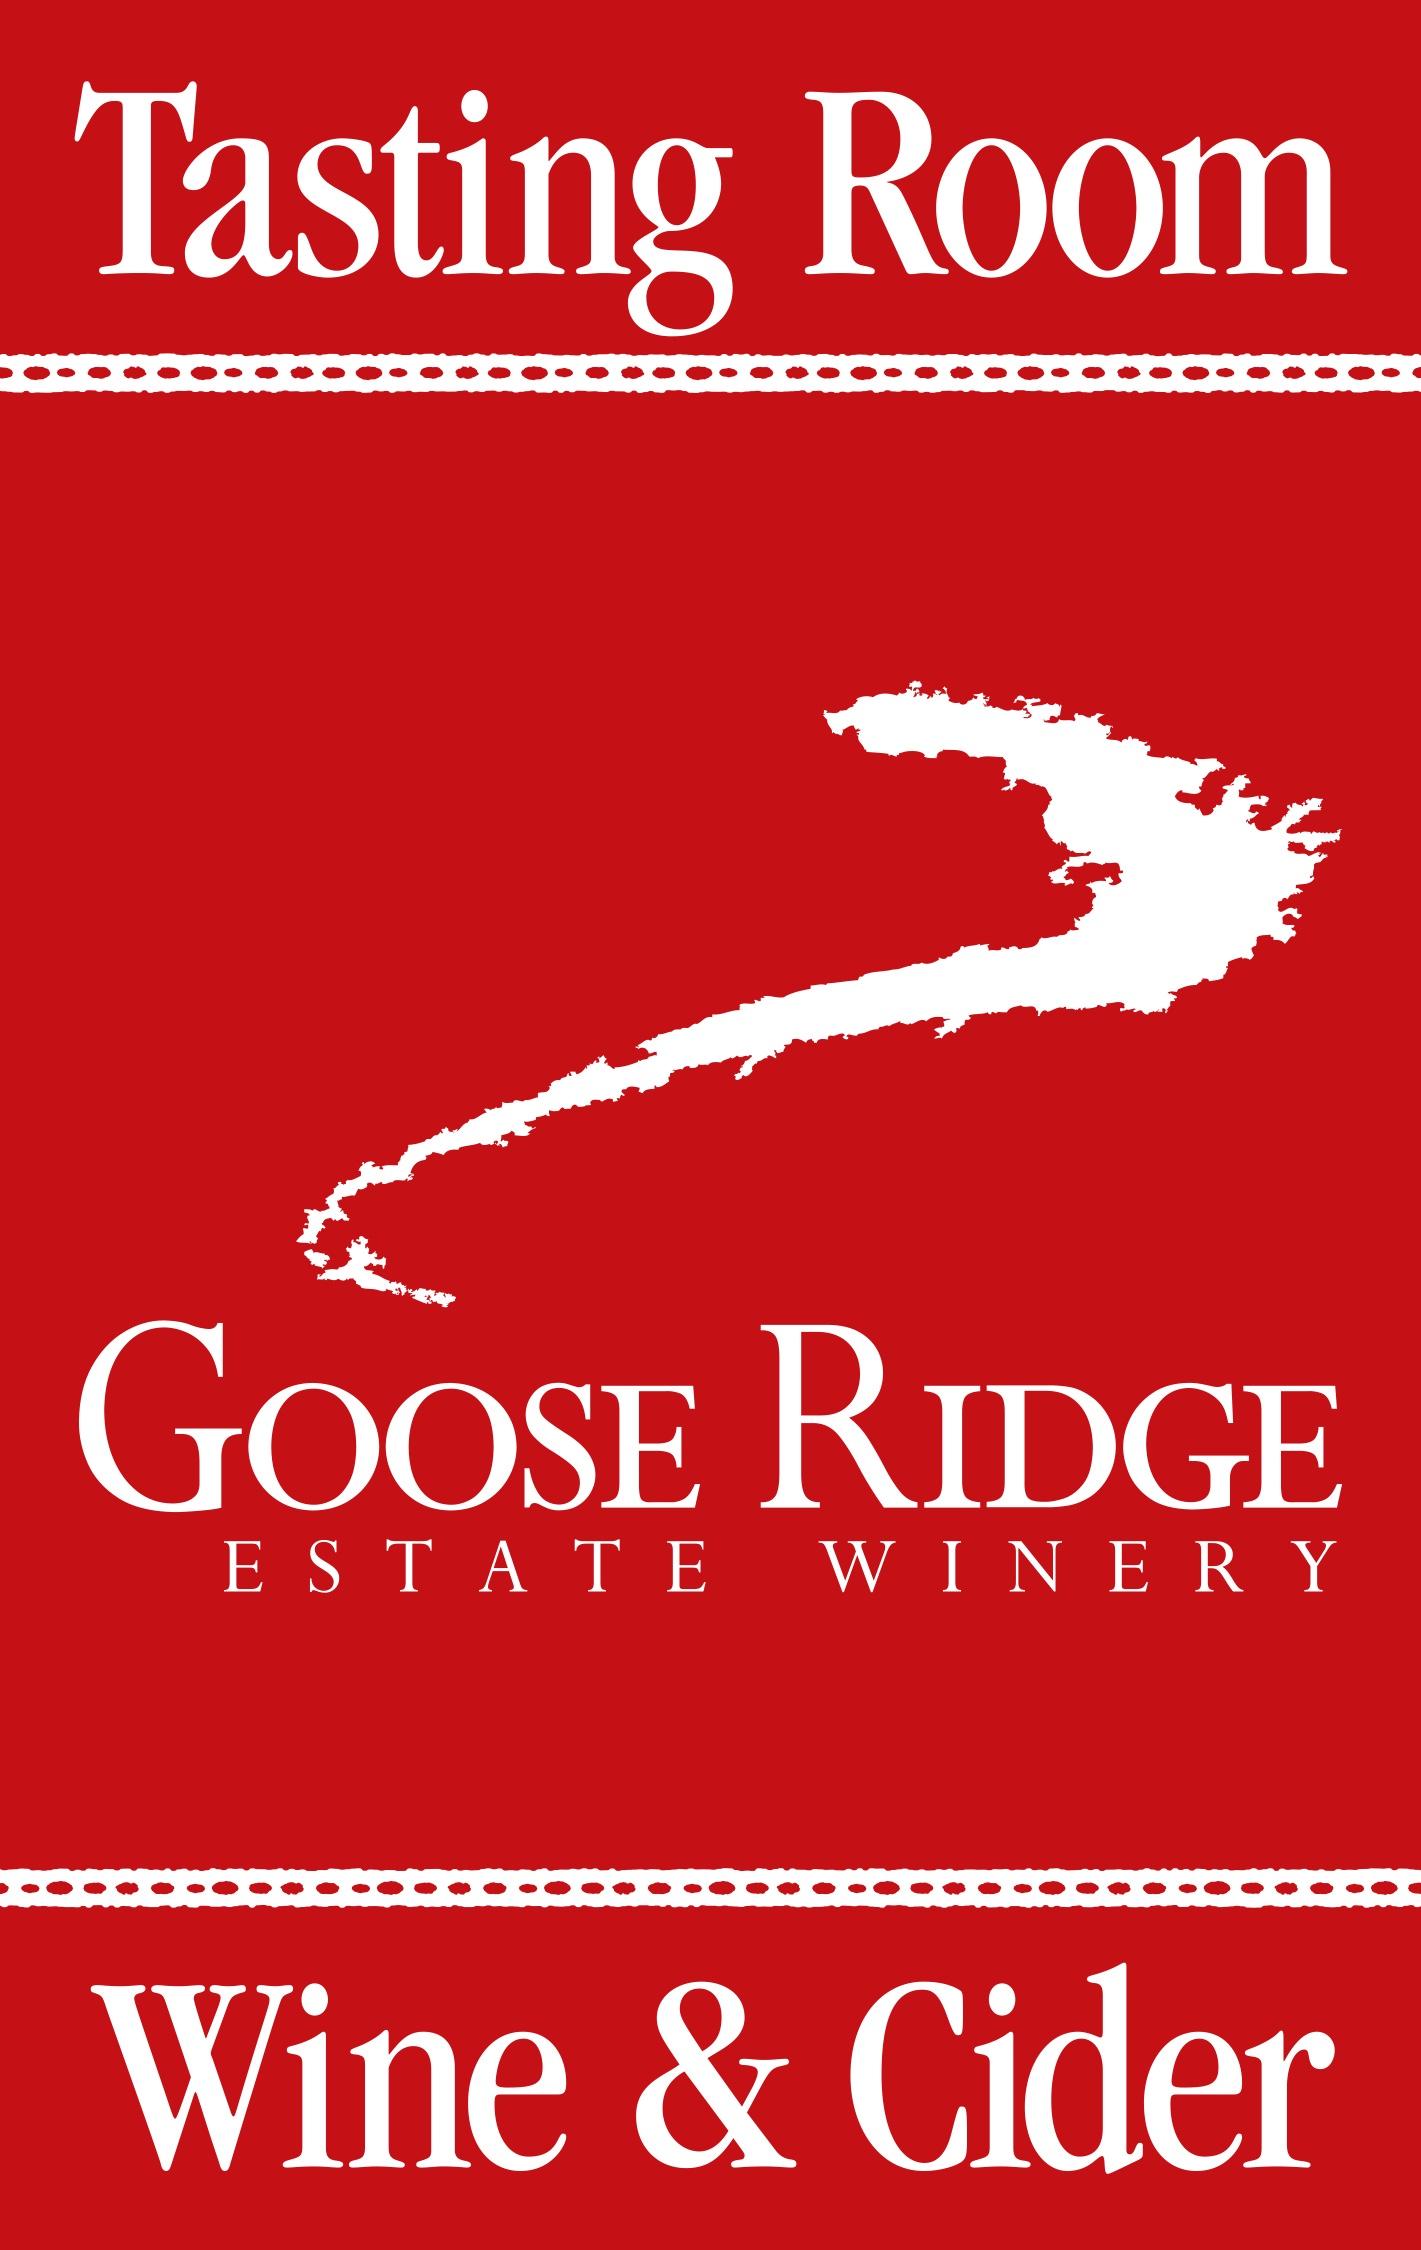 Goose Ridge Sign Options-4.jpg